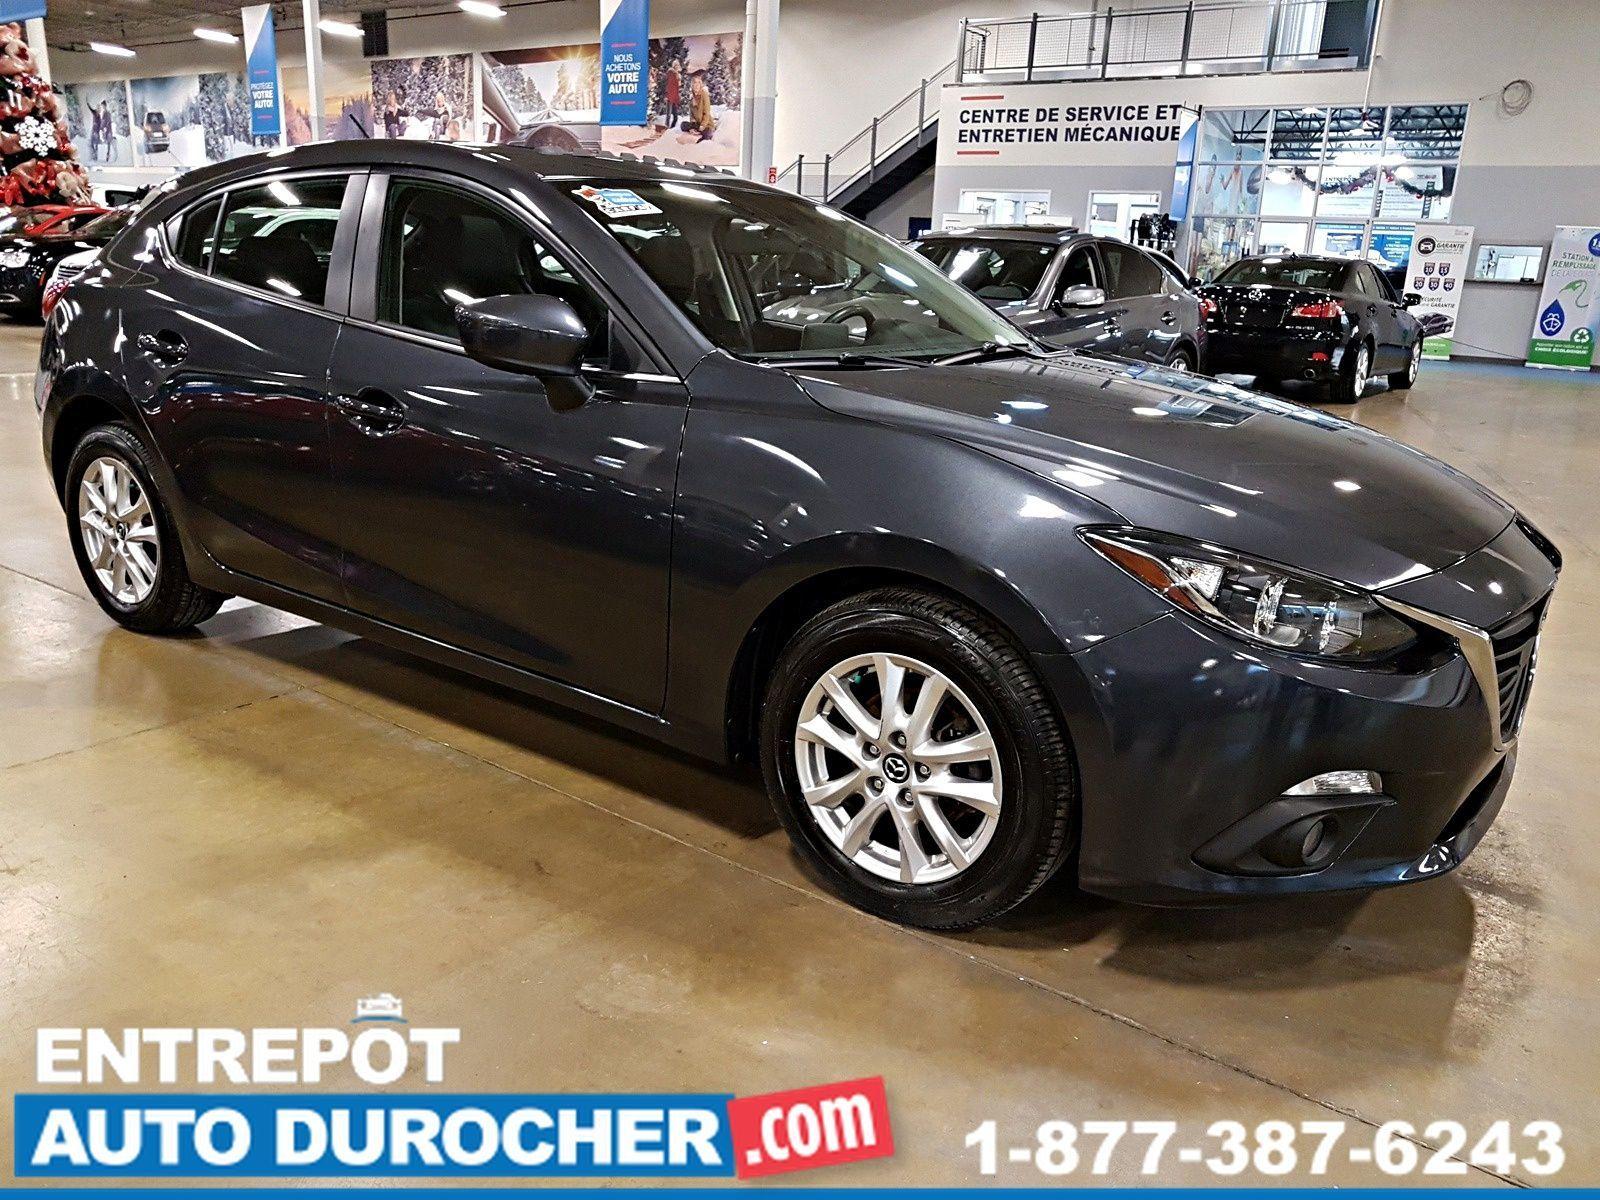 2015 Mazda Mazda3 GS - NAVIGATION - TOIT OUVRANT - A/C - Caméra de Recul